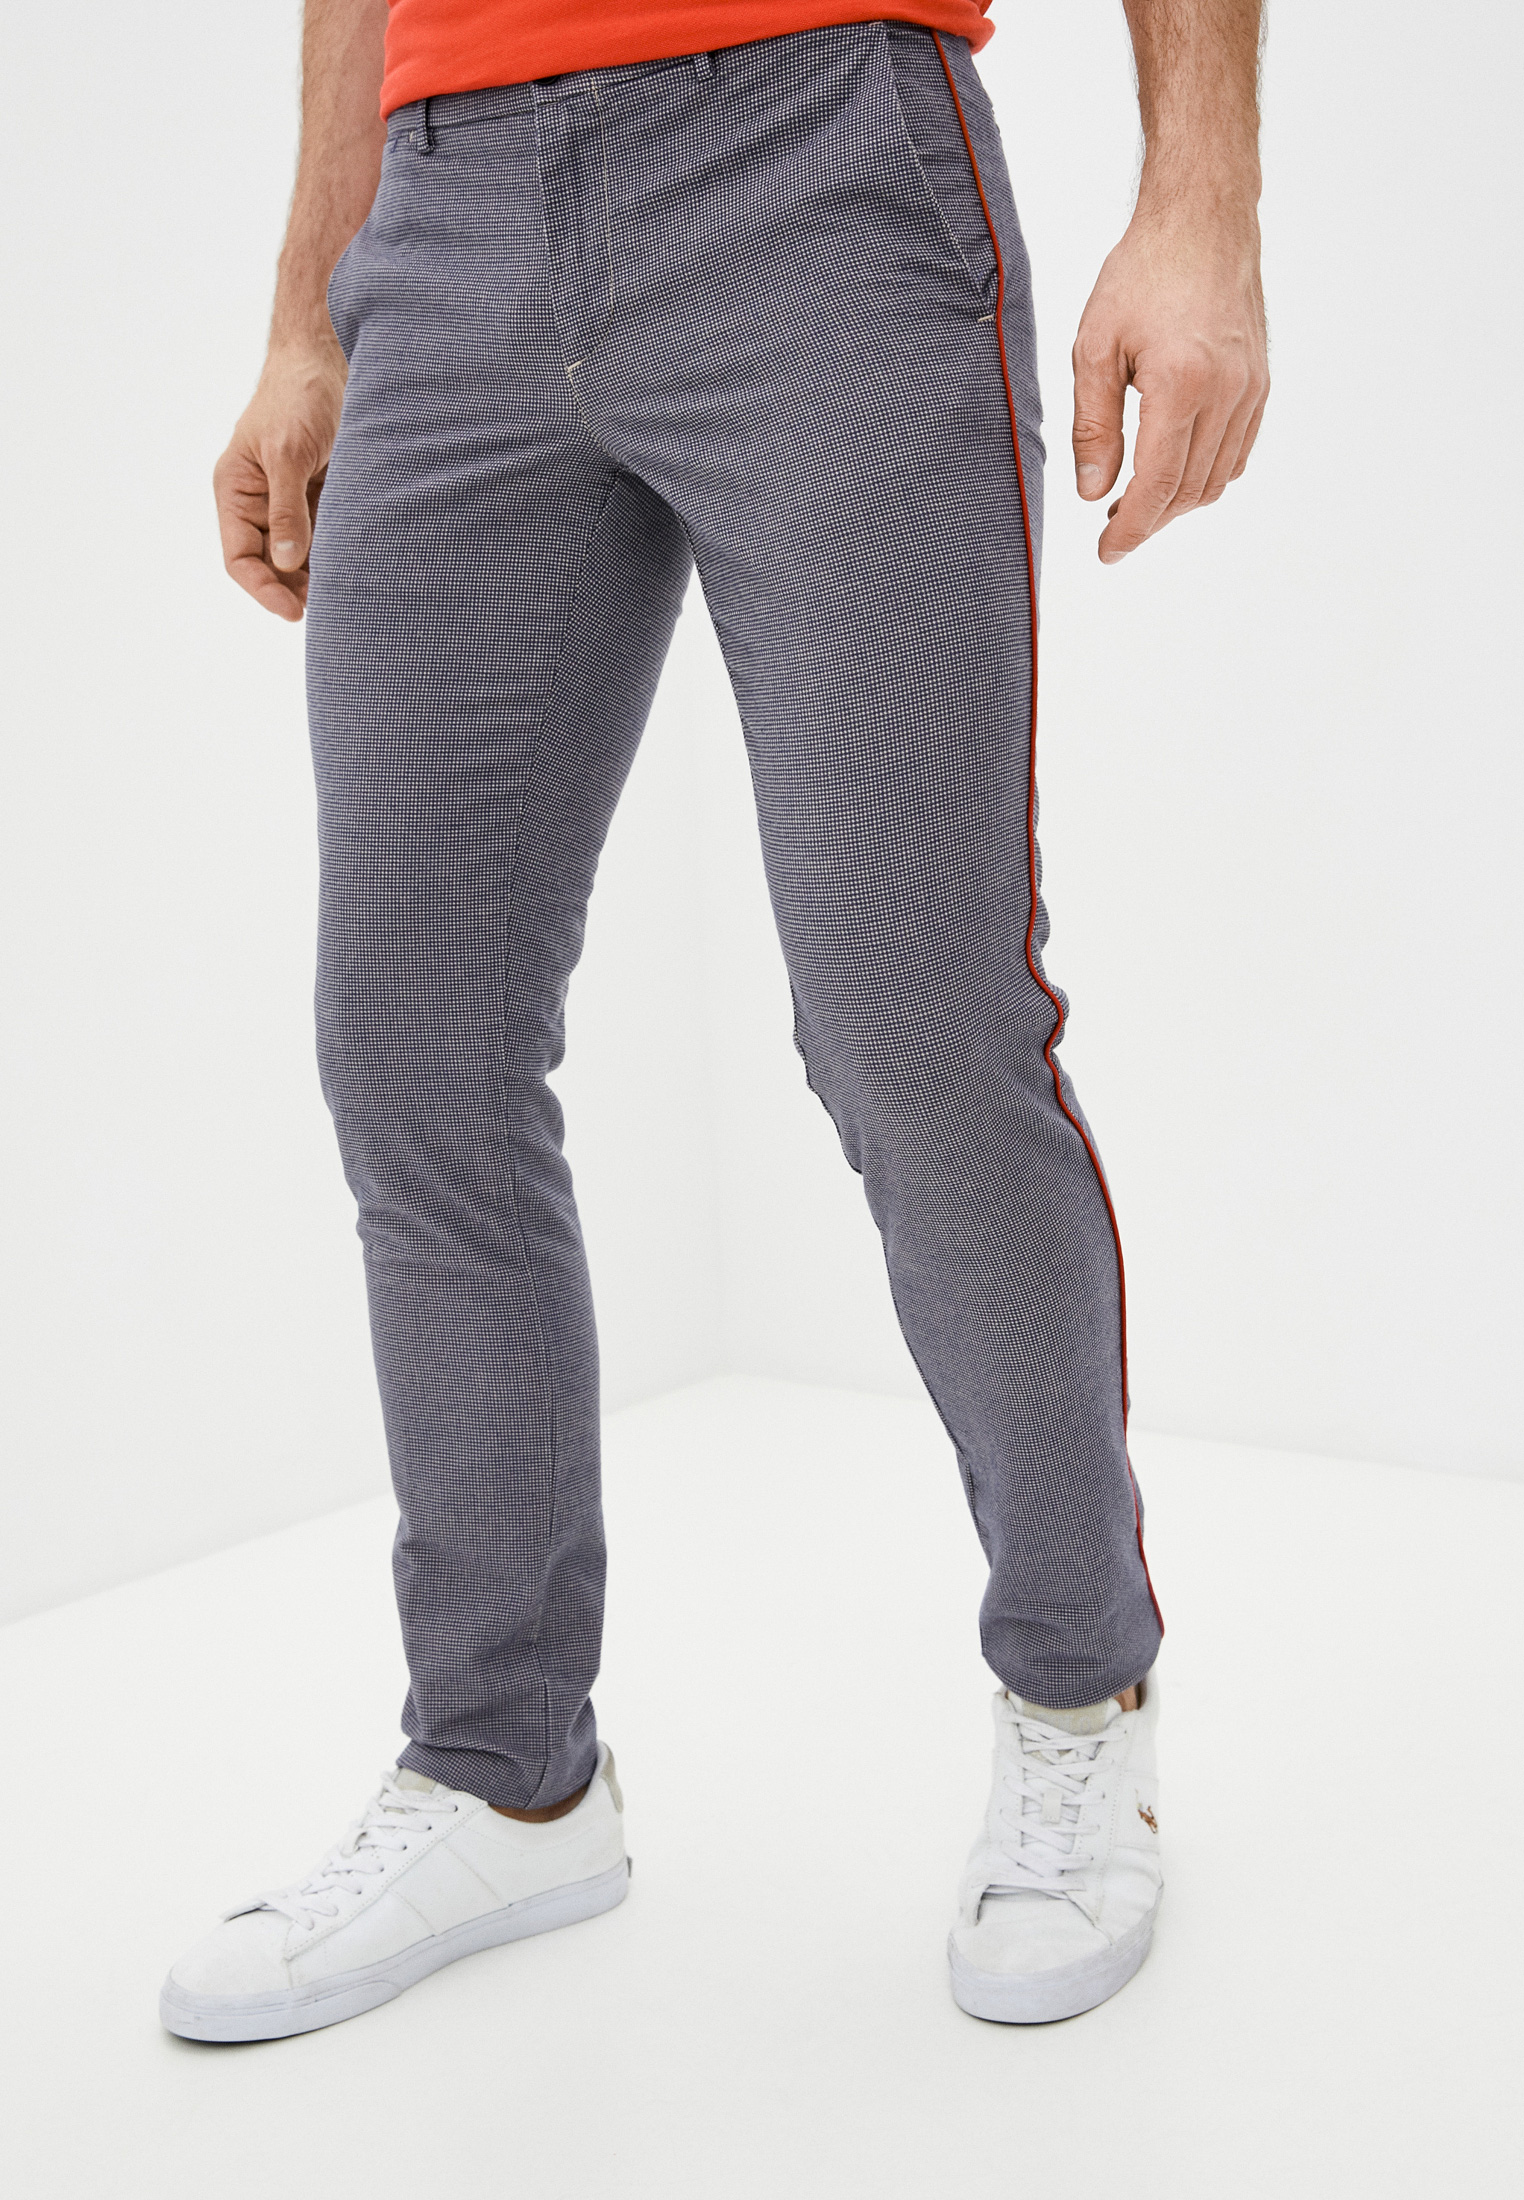 Мужские брюки Trussardi 52P00000-1T002338-H-001